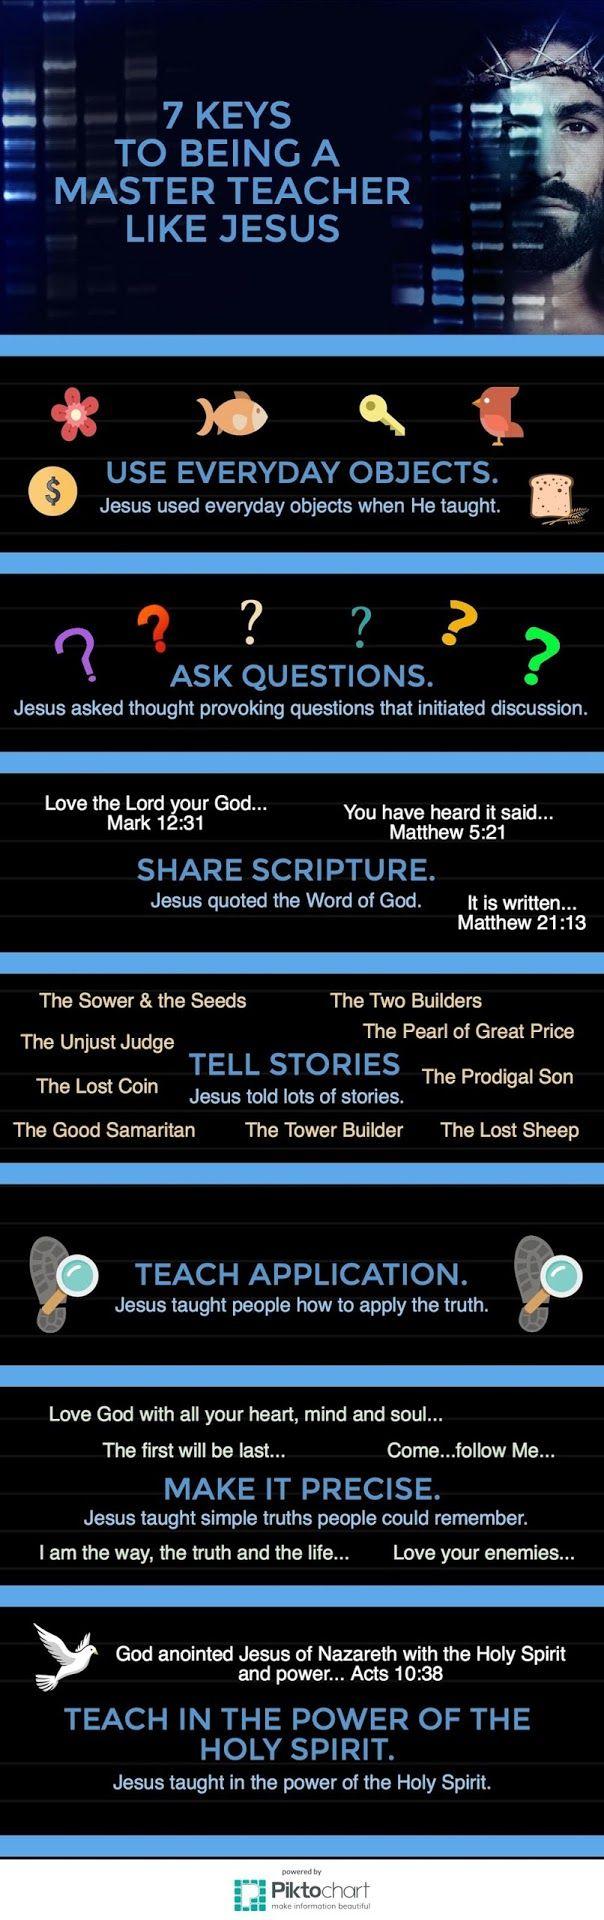 7 Keys to Being a Master Teacher Like Jesus ~ RELEVANT CHILDREN'S MINISTRY